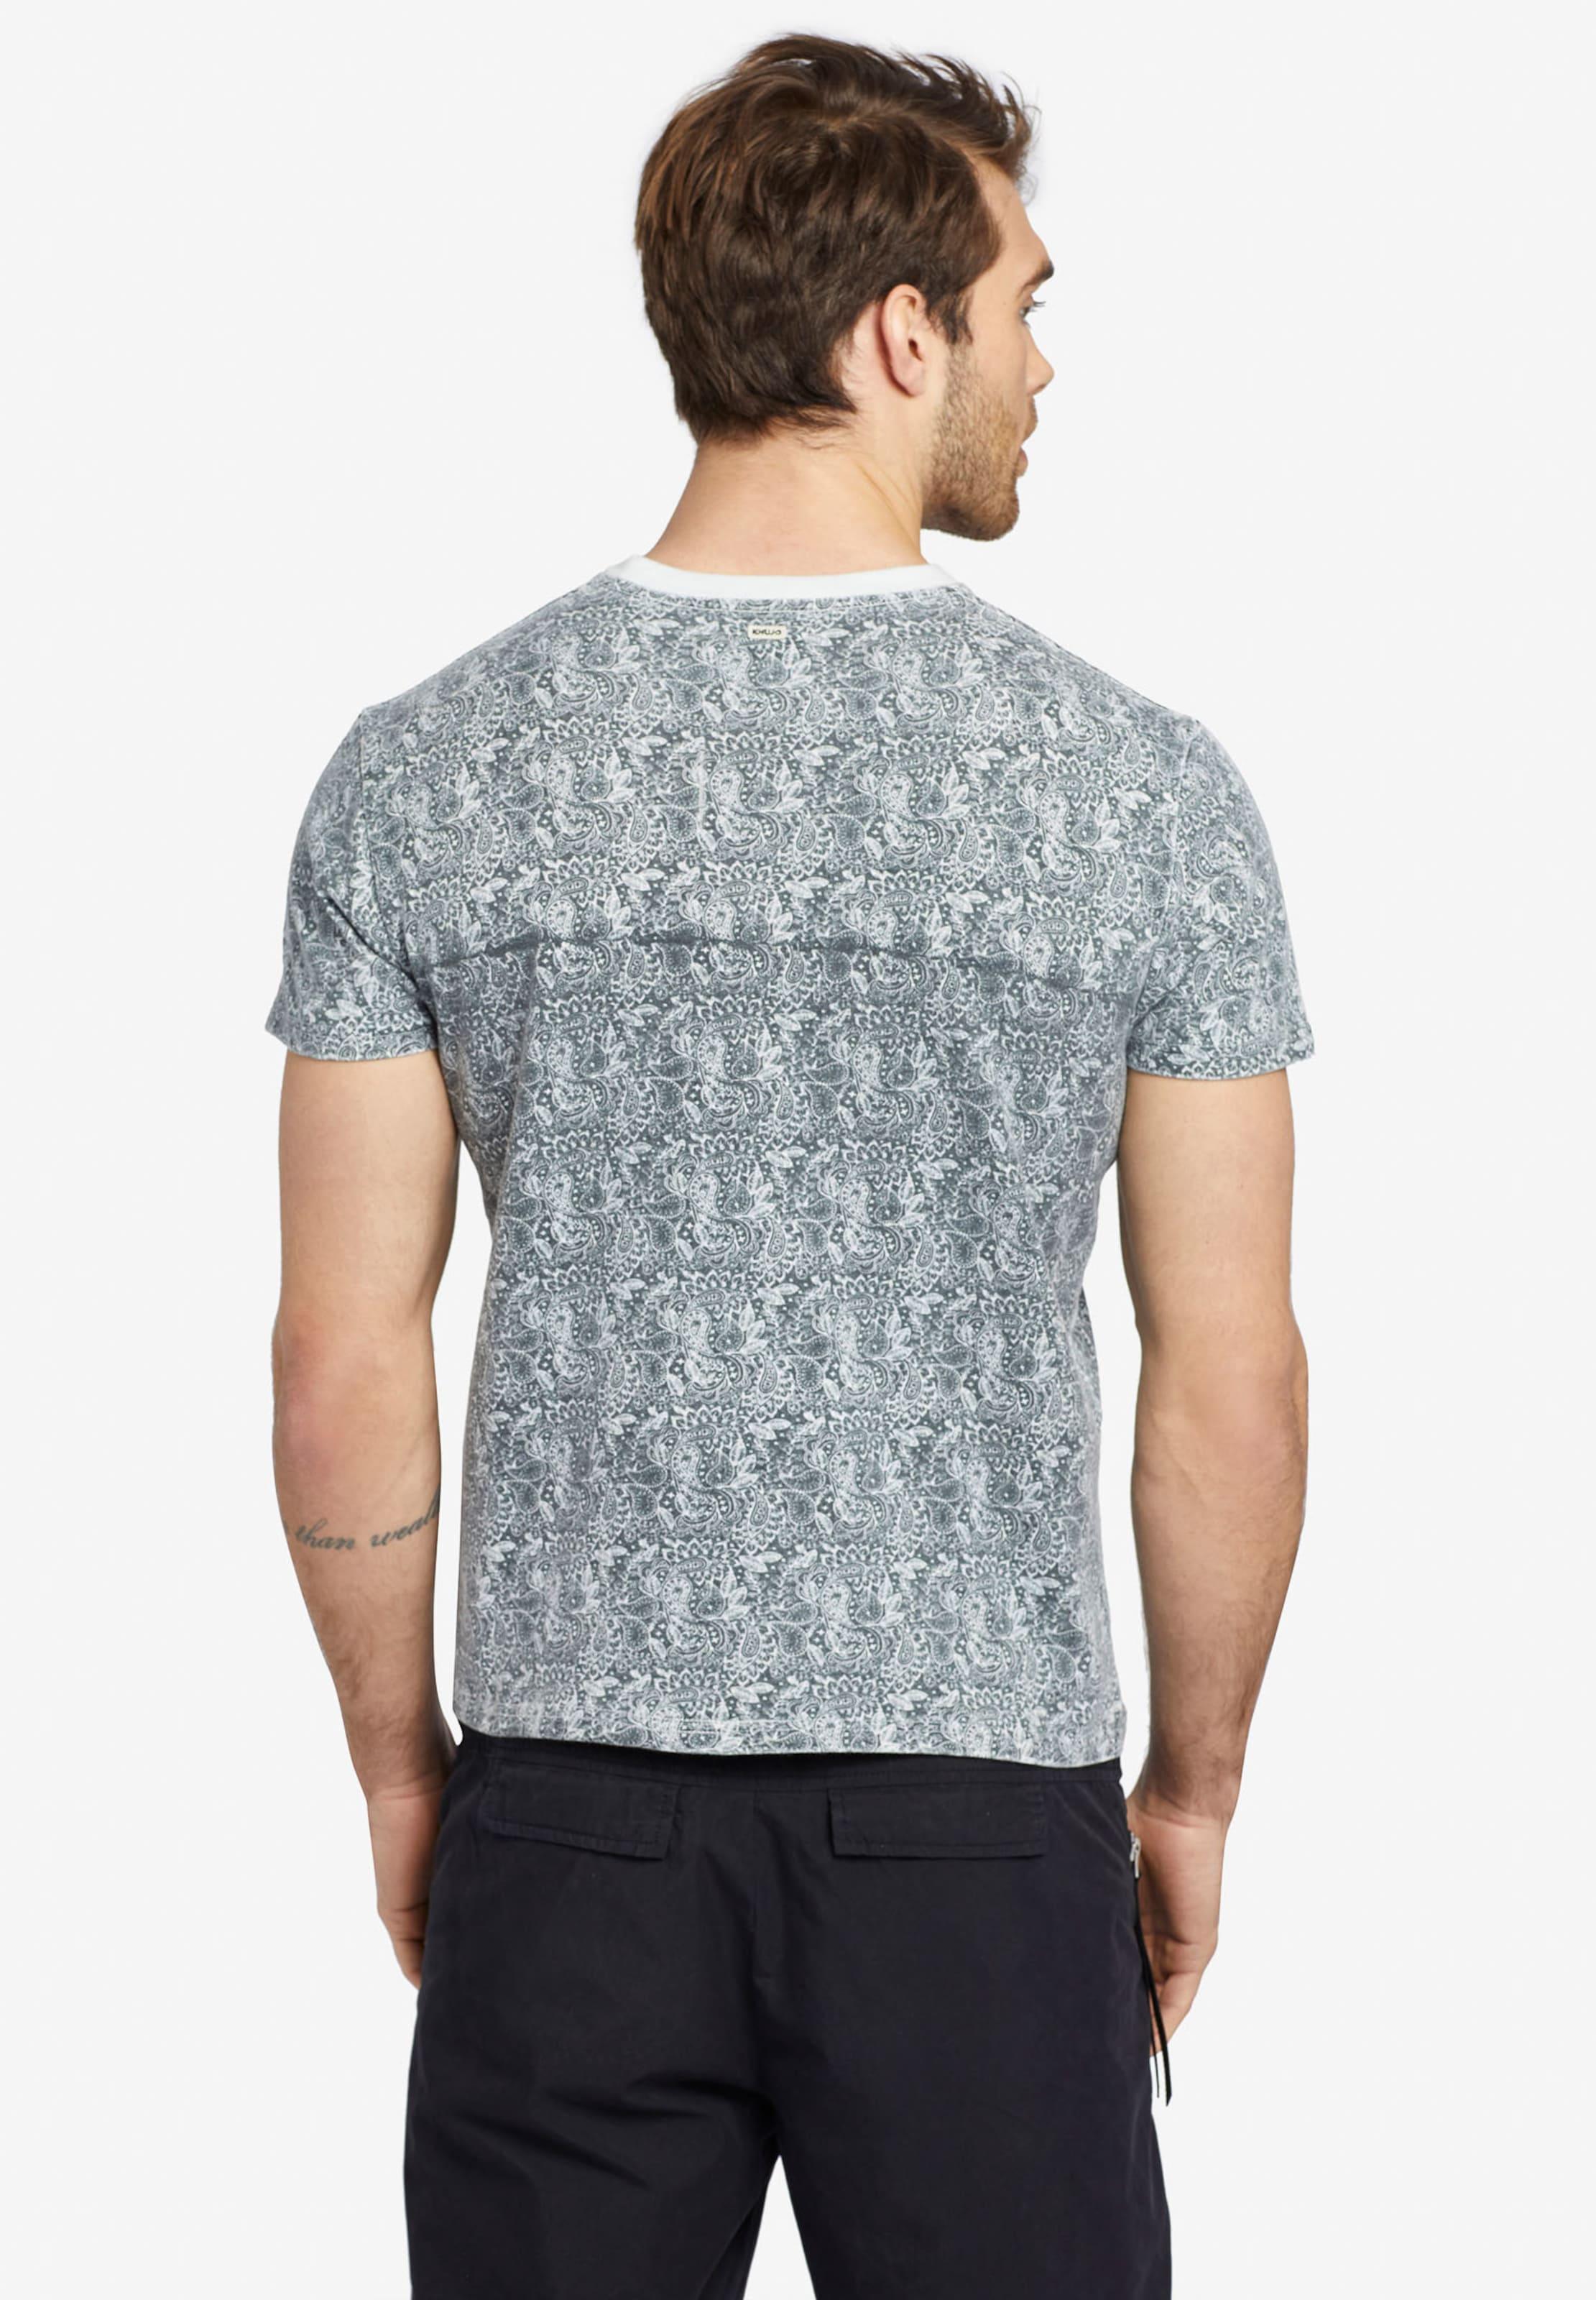 Khujo Chiné T Paisley ' Elijah shirt Gris Aop En xBdCWore